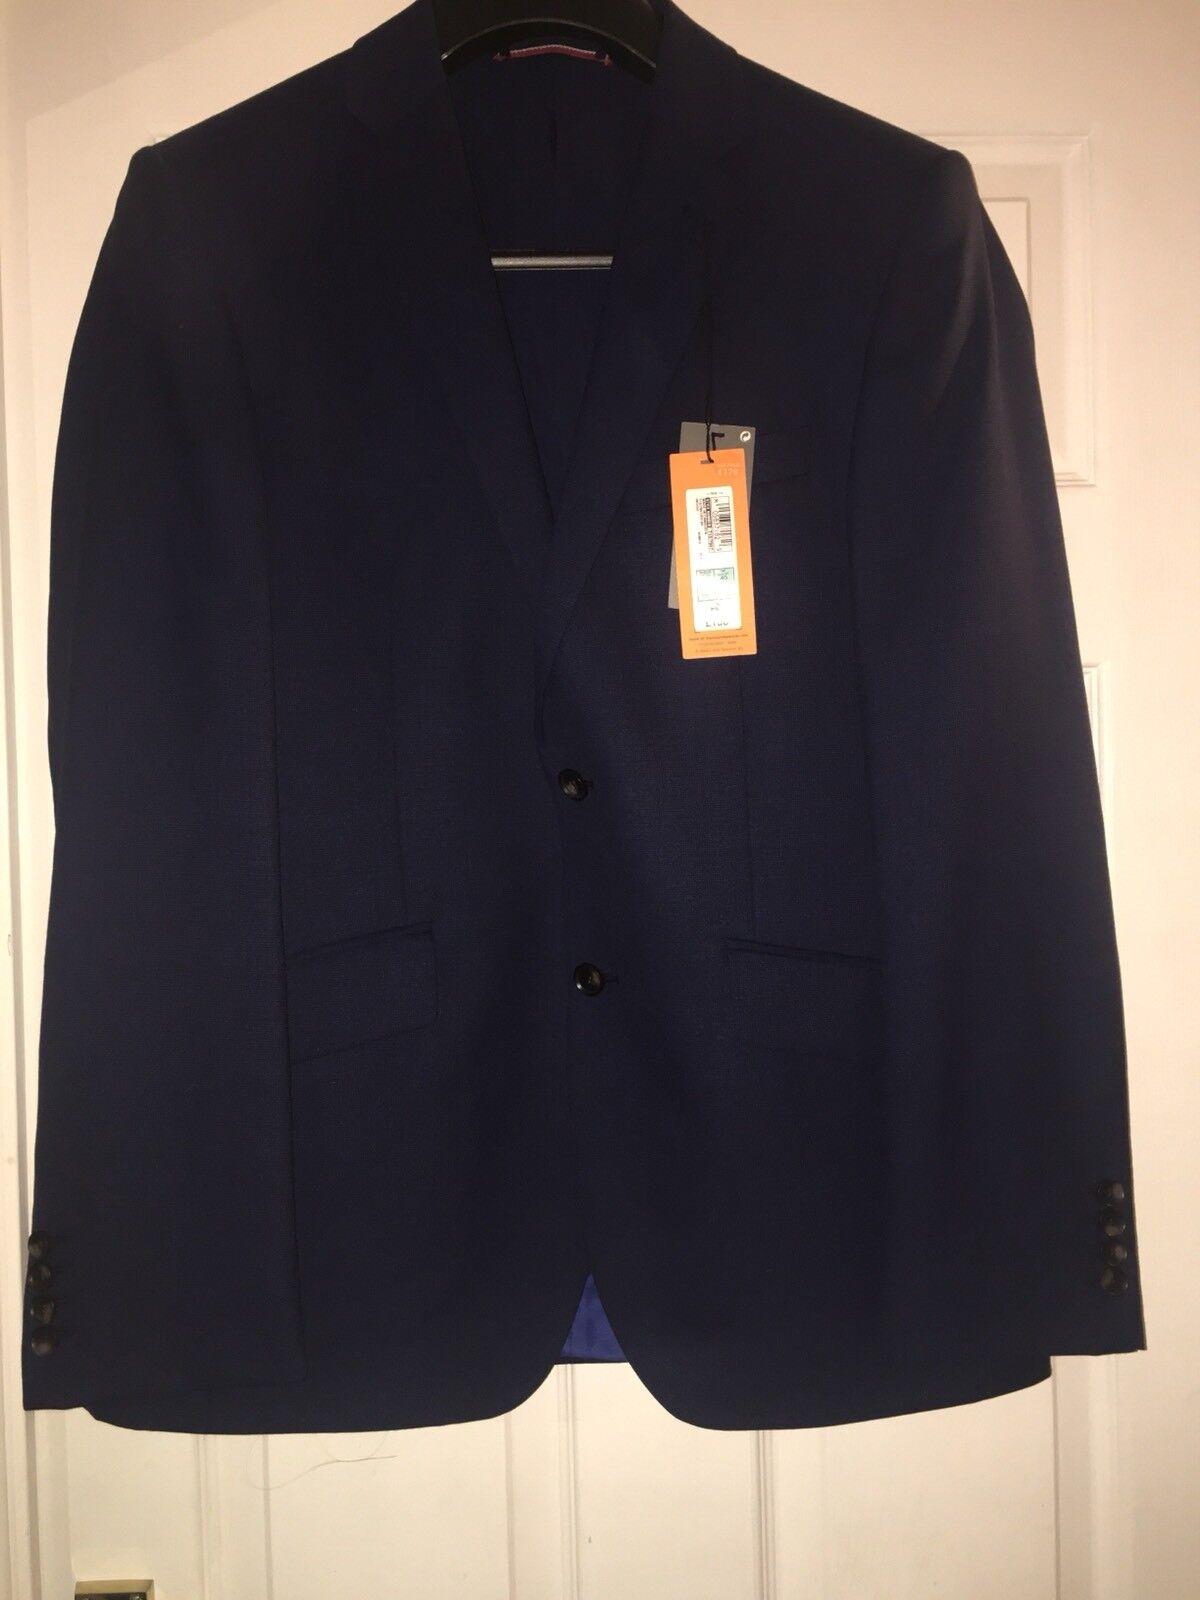 "Wool Blend Men's Blazer 40"" Medium BNWT, M&S"